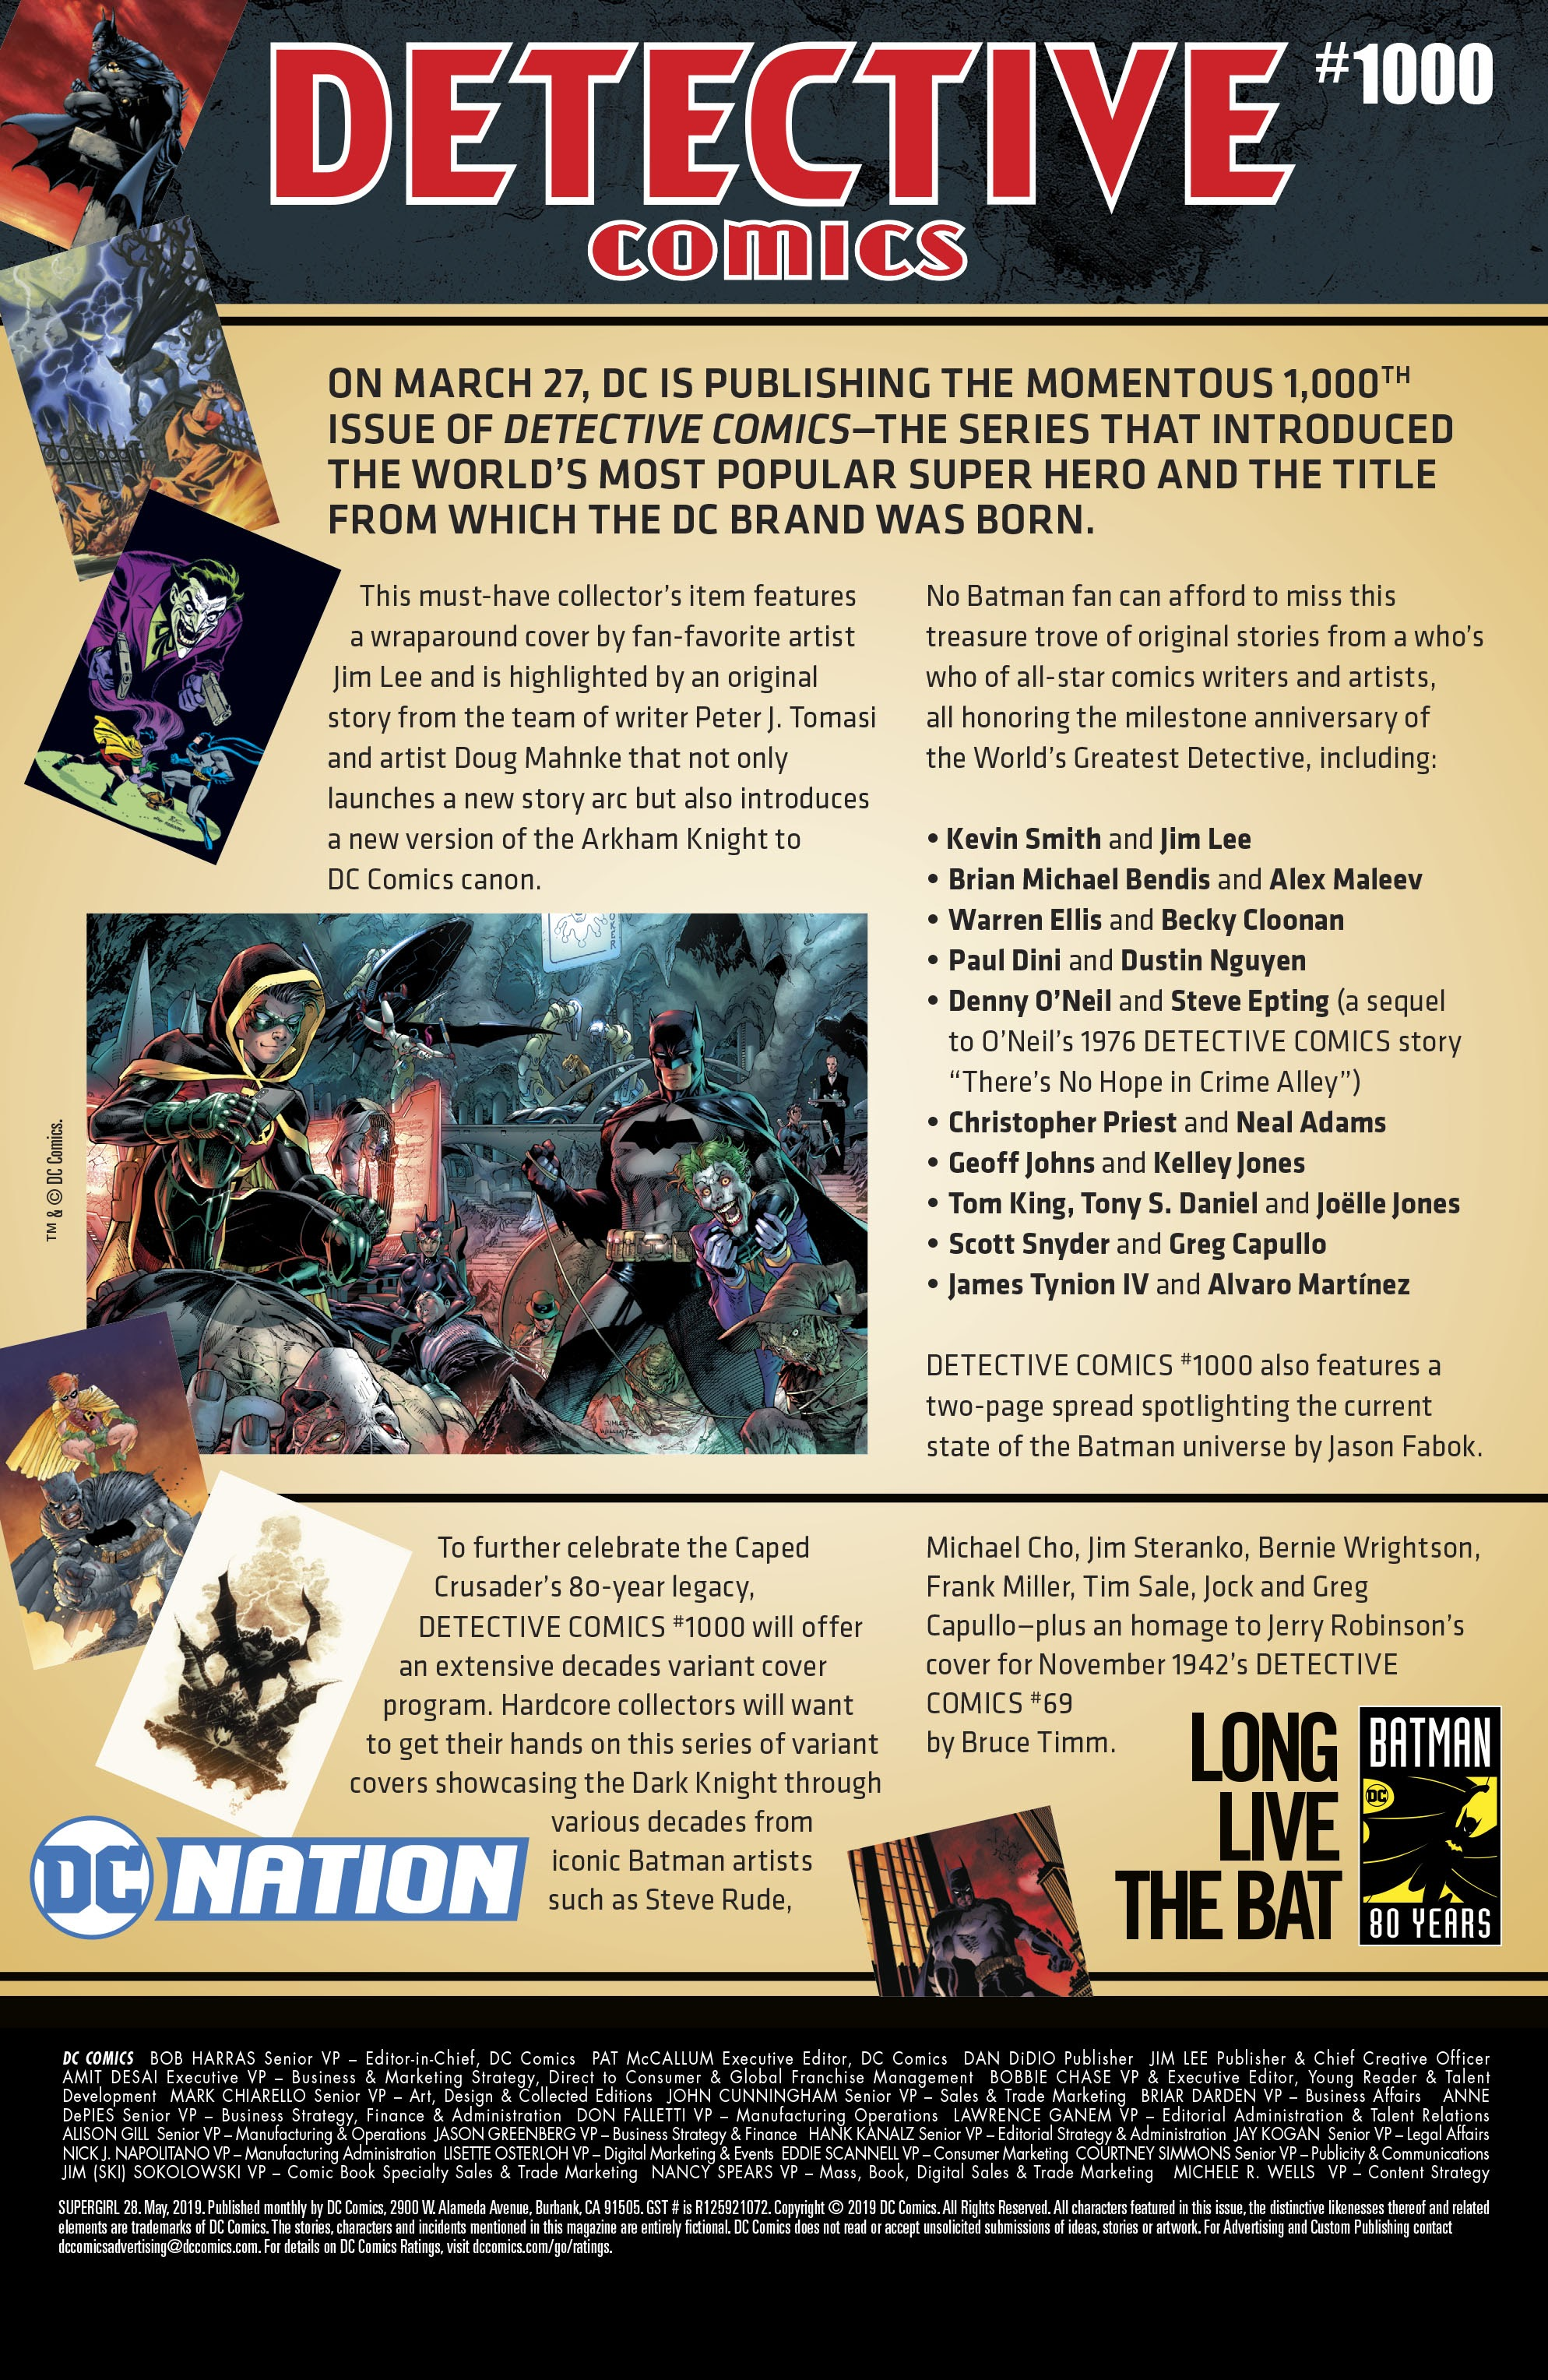 Supergirl (2016) Issue # 28 - ReadComic.Org